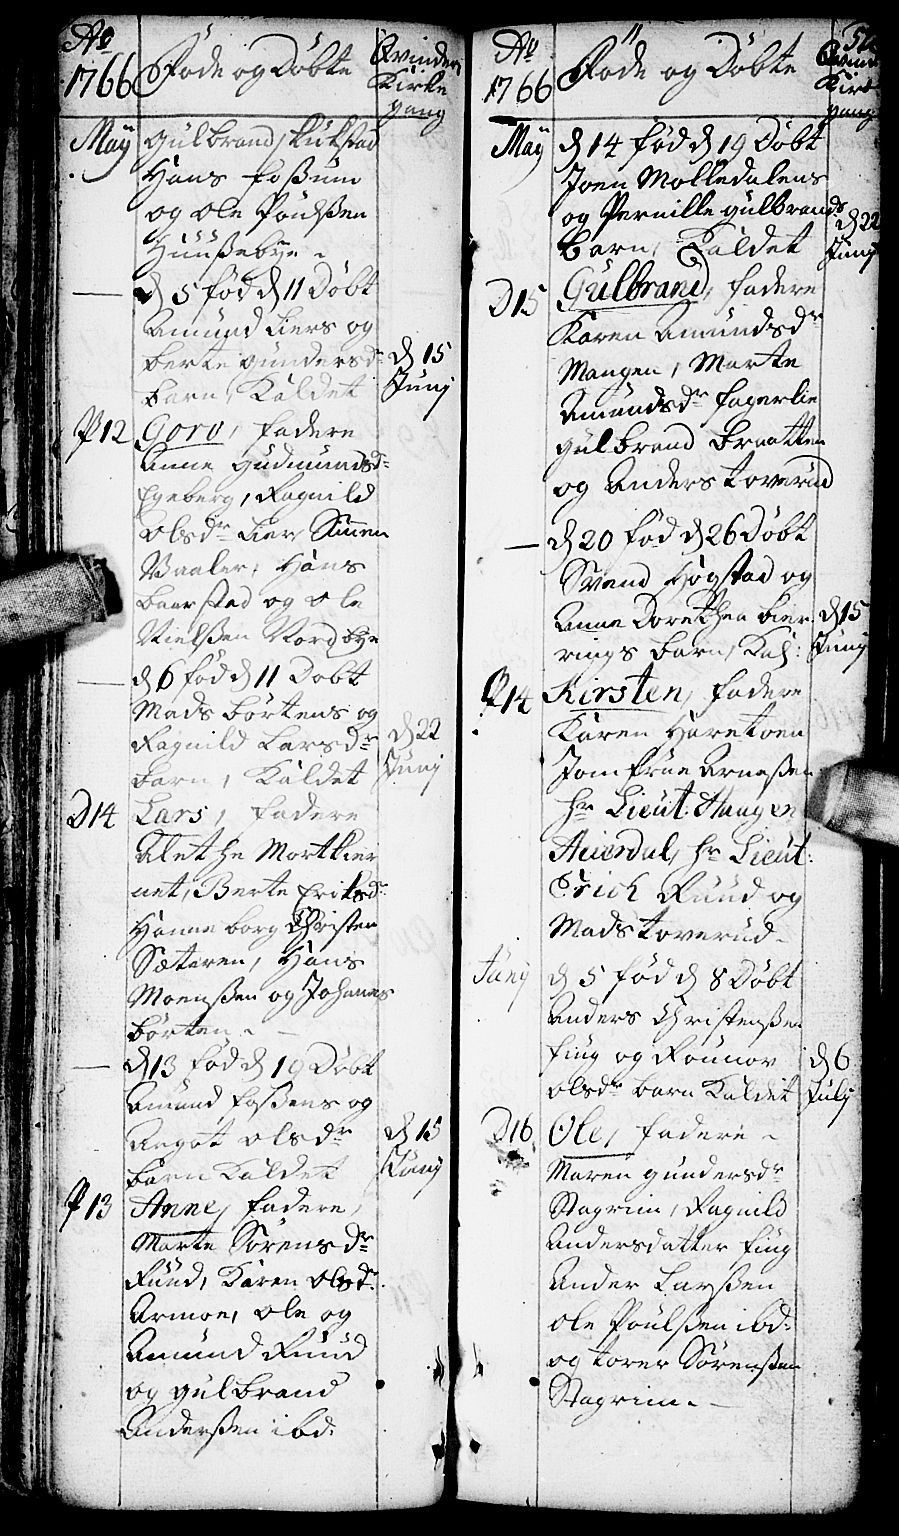 SAO, Aurskog prestekontor Kirkebøker, F/Fa/L0002: Ministerialbok nr. I 2, 1735-1766, s. 52